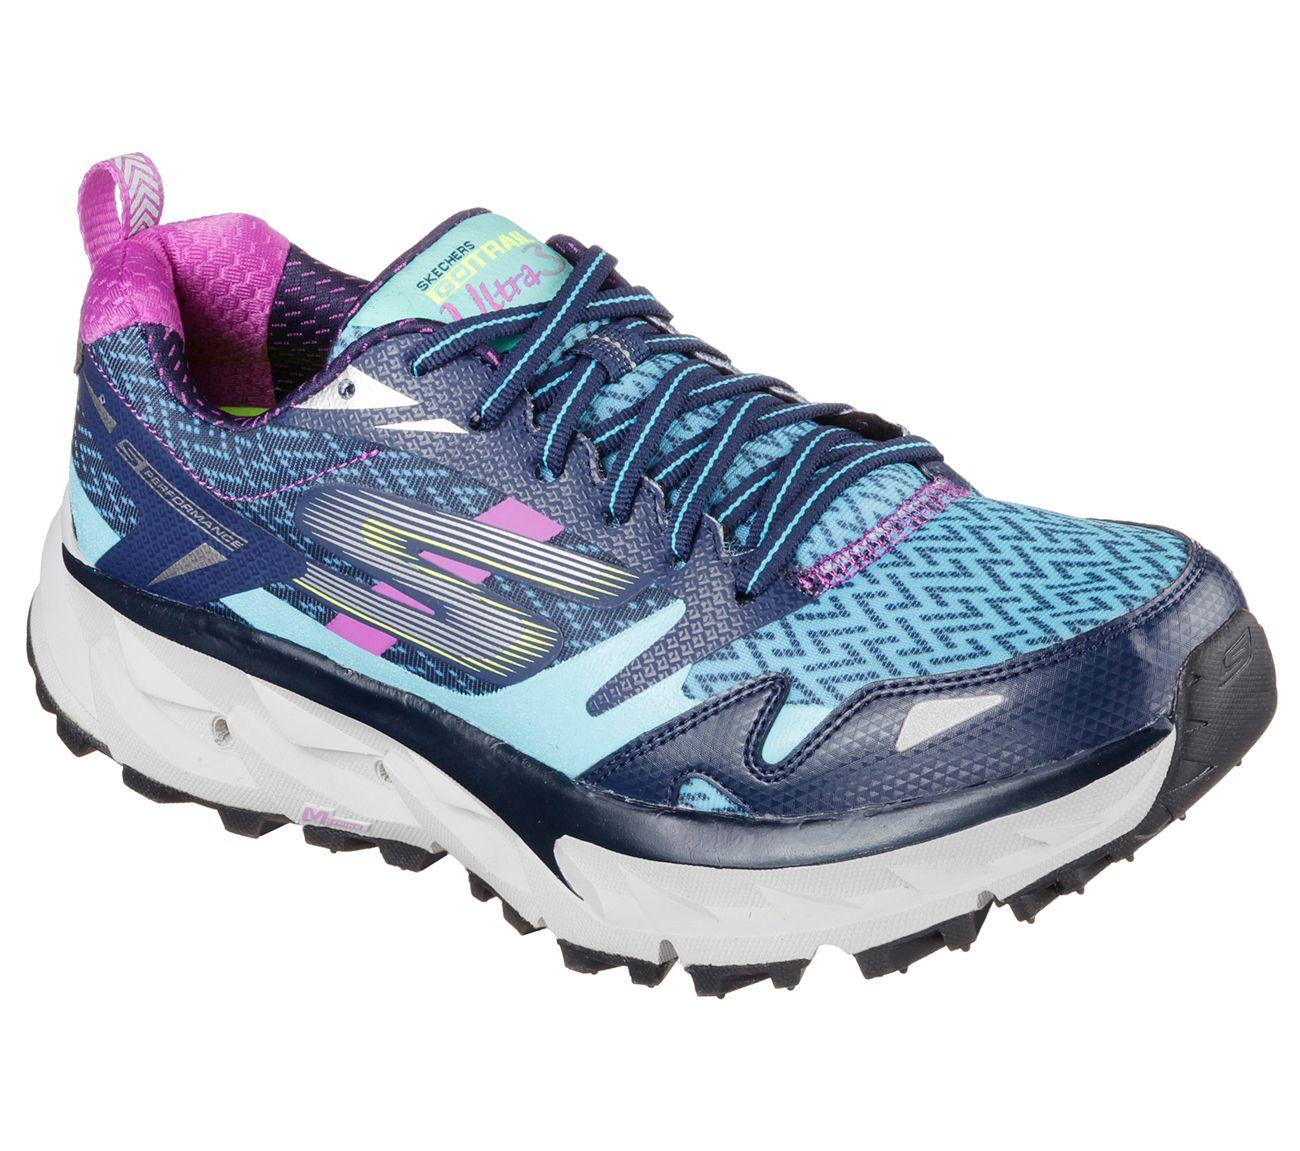 Galaxia Espectáculo lo mismo  Skechers GOtrail Ultra 3 | Shoes, Running shoes, Skechers